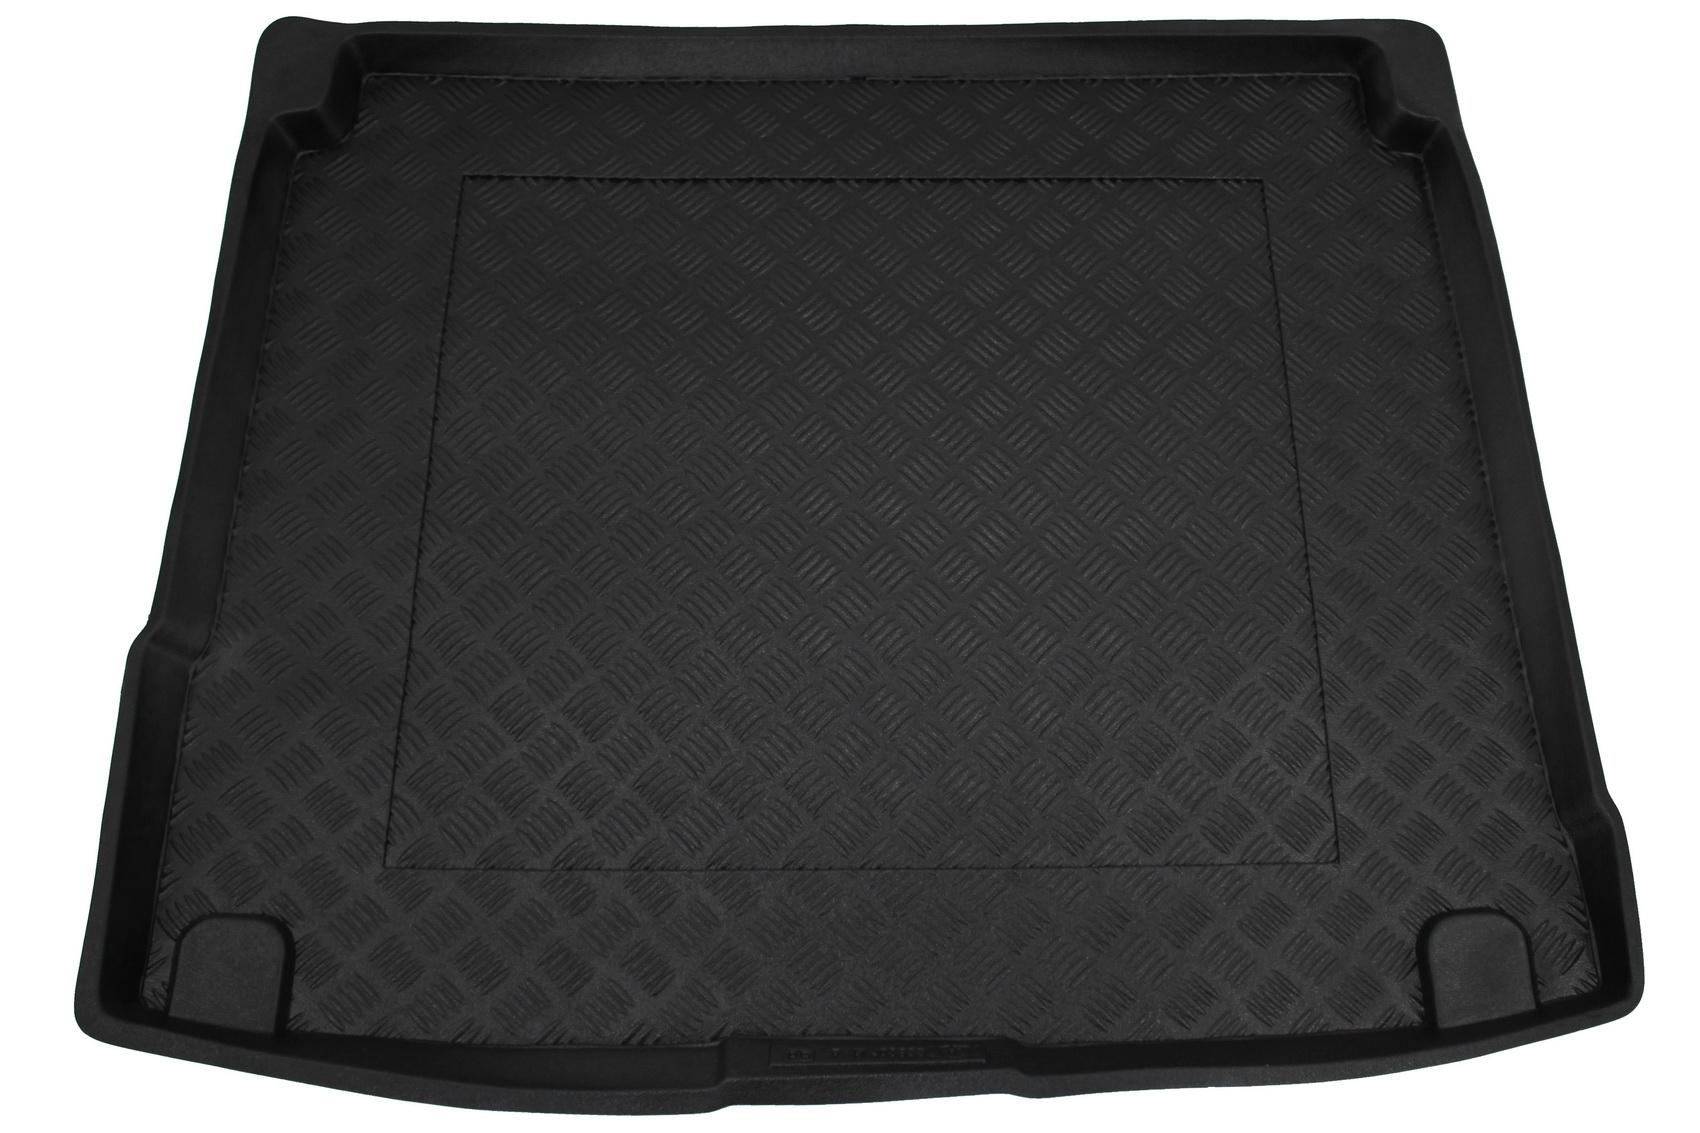 Covoras tavita portbagaj  compatibil cu Volvo XC60 II 2017 -